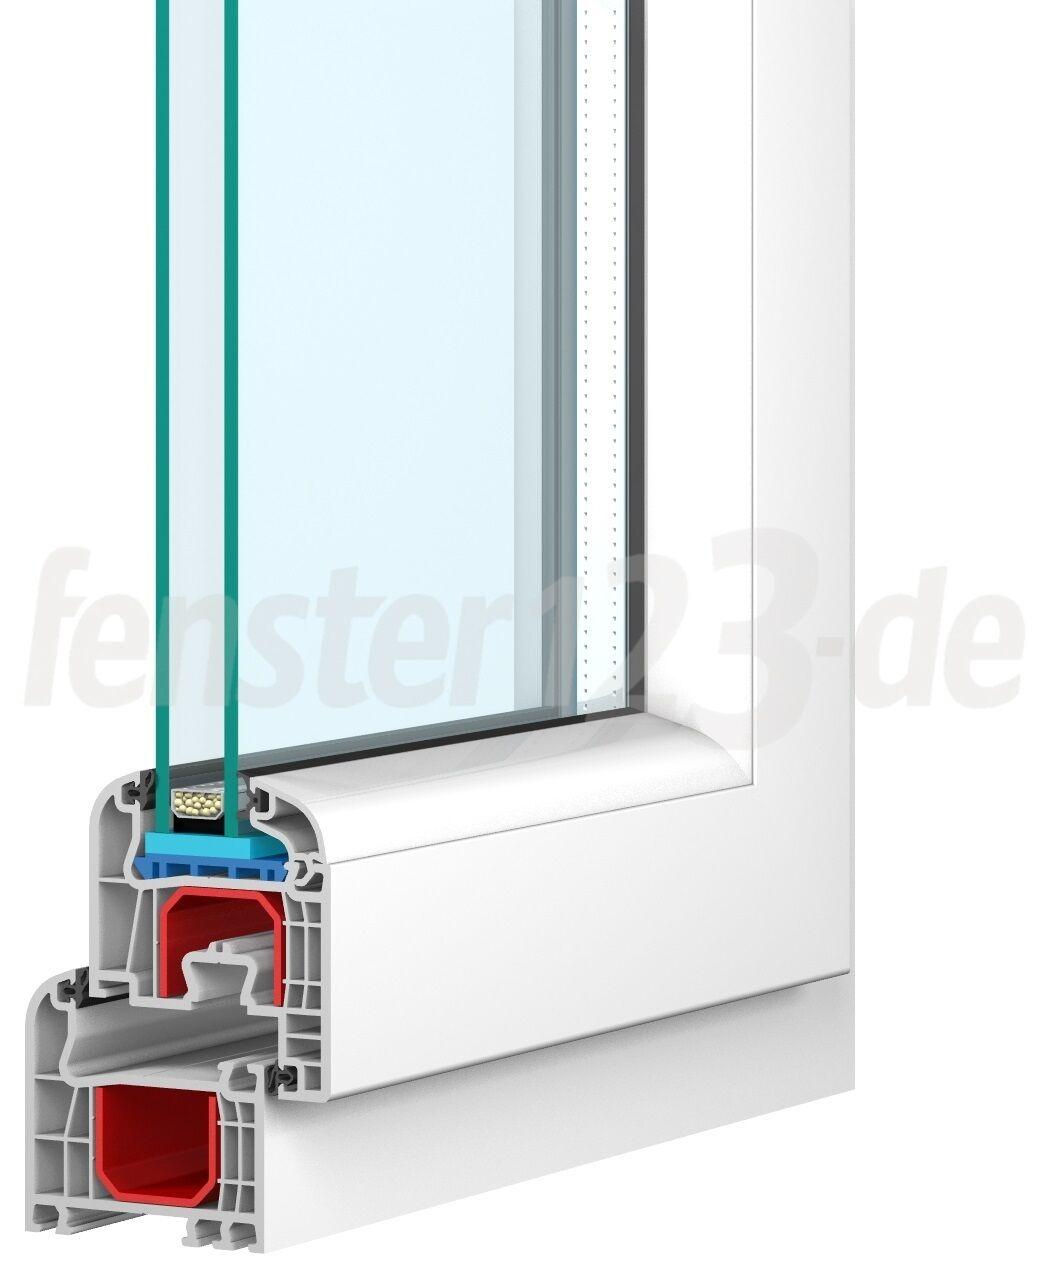 Fenster Kunststofffenster PVC Breite 1400mm alle Höhen Dreh Kipp Kunststoff NEU